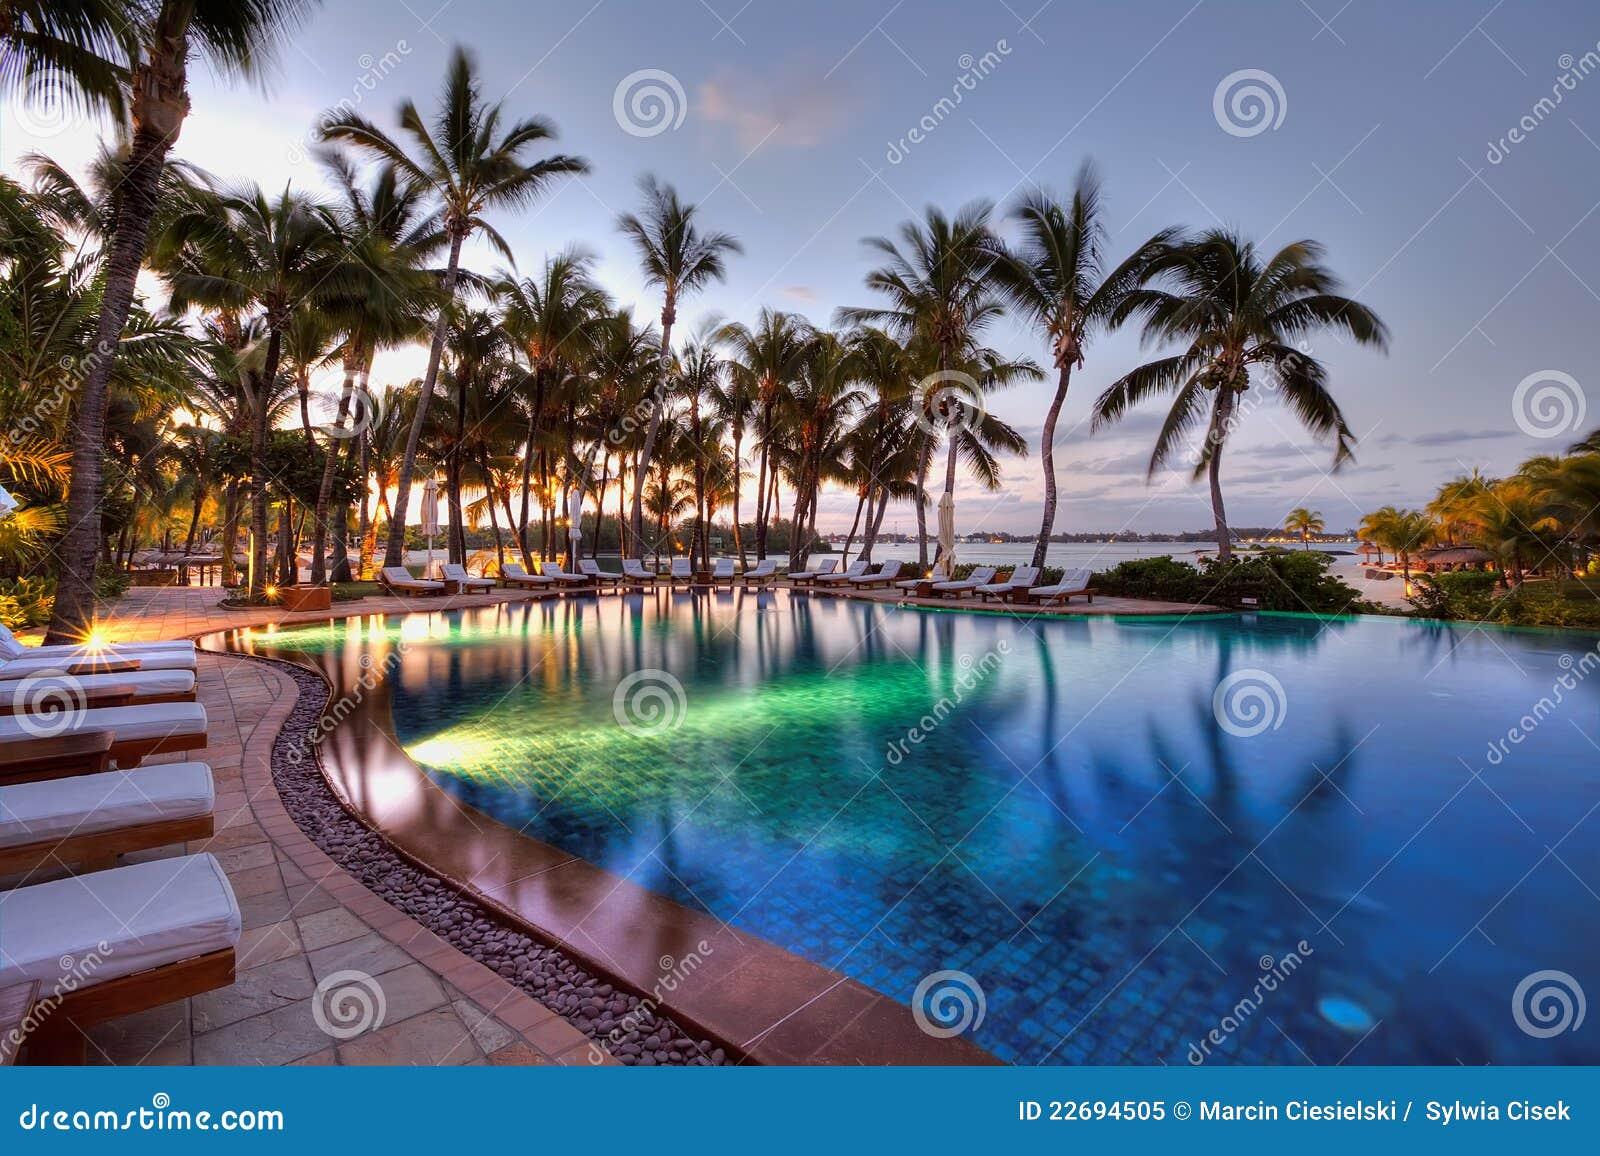 Swimming pool at le touessrock mauritius editorial image for Swimming pool mauritius